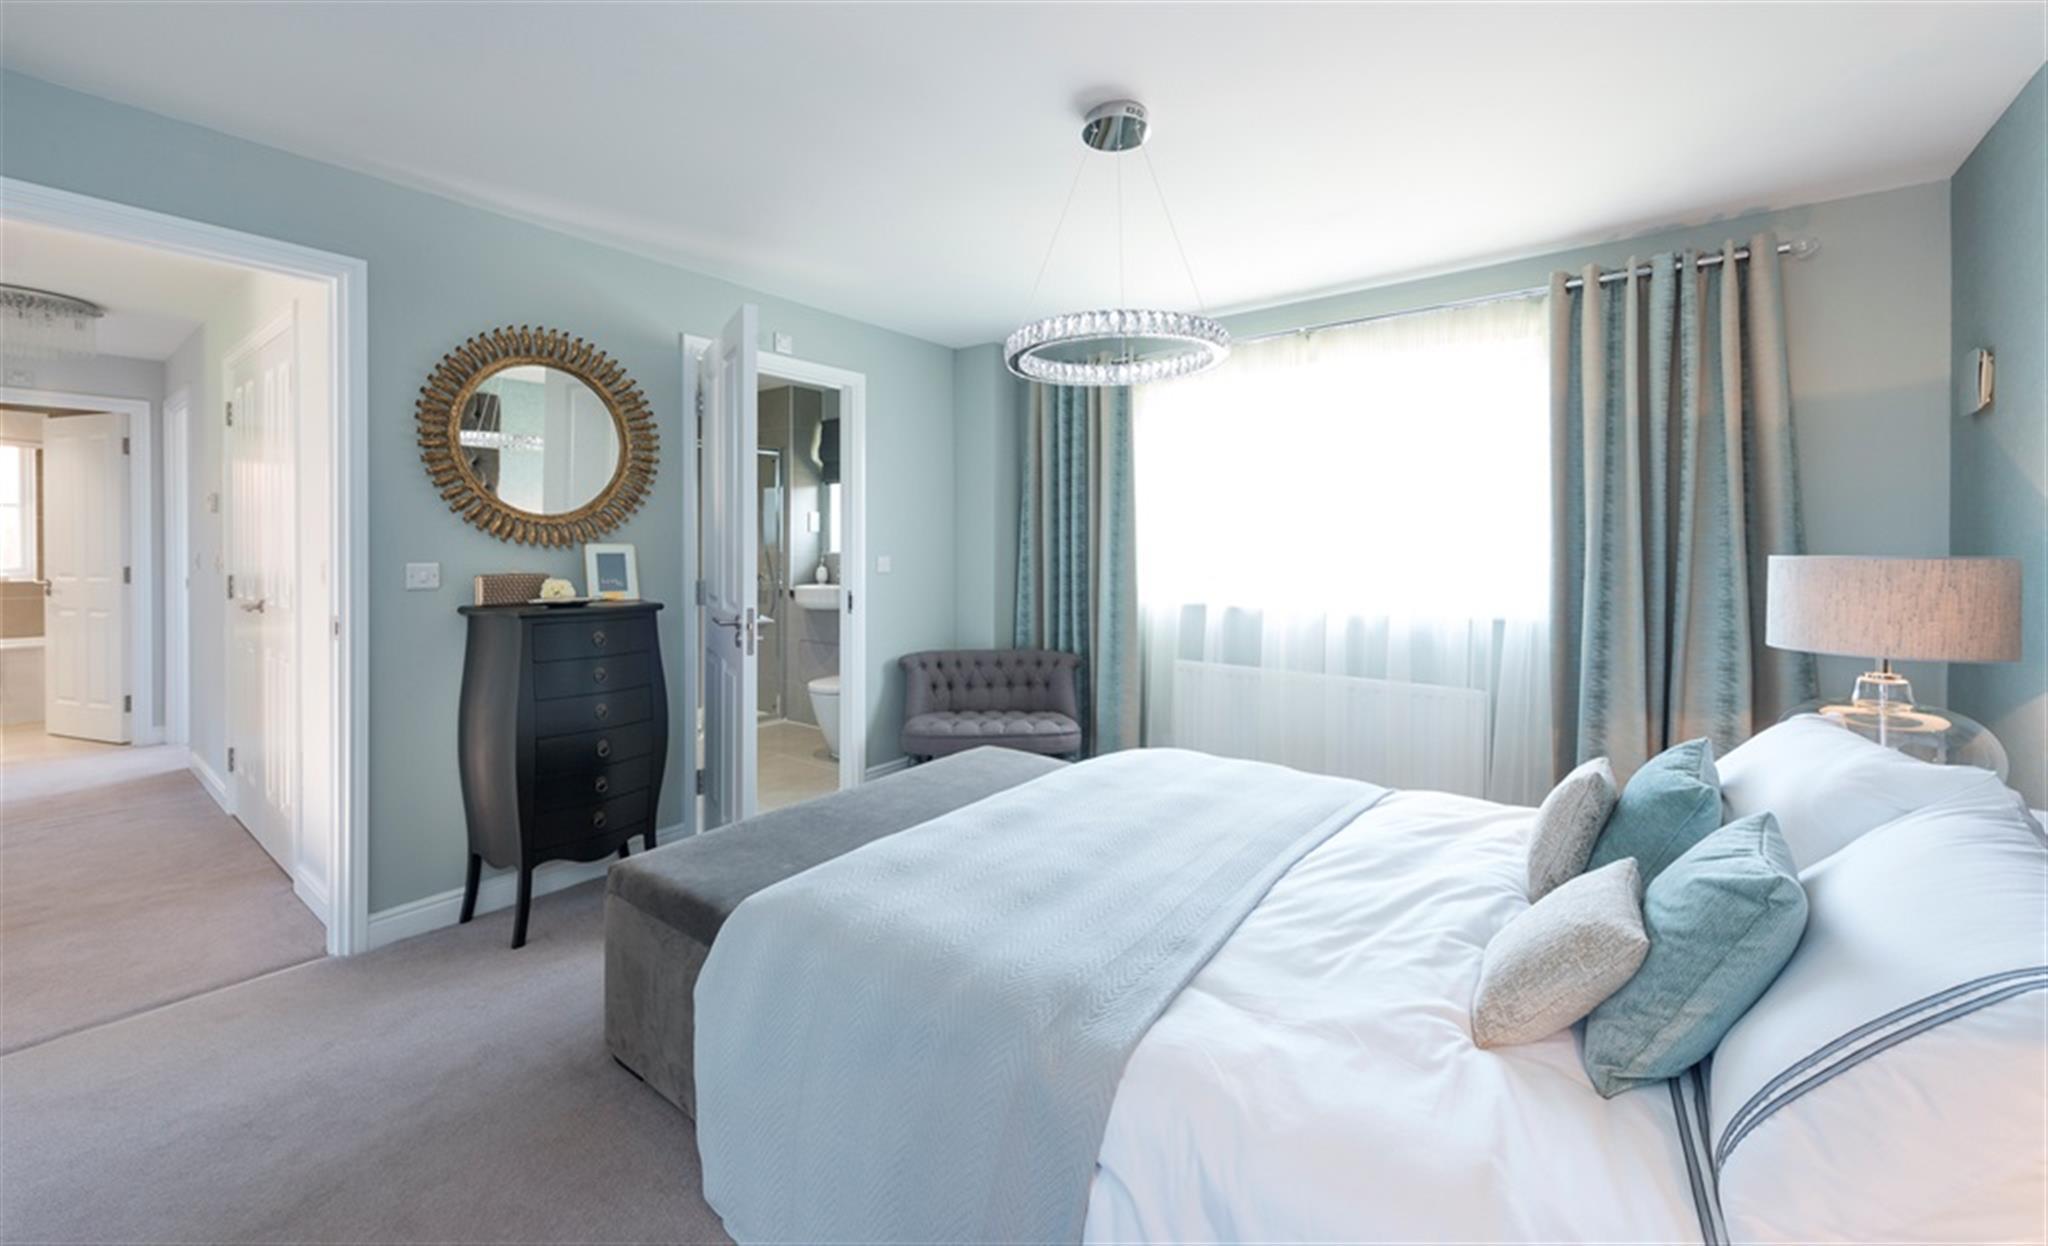 4 bedroom detached house for sale, ., Collingridge Way, Ewell, Epsom ...